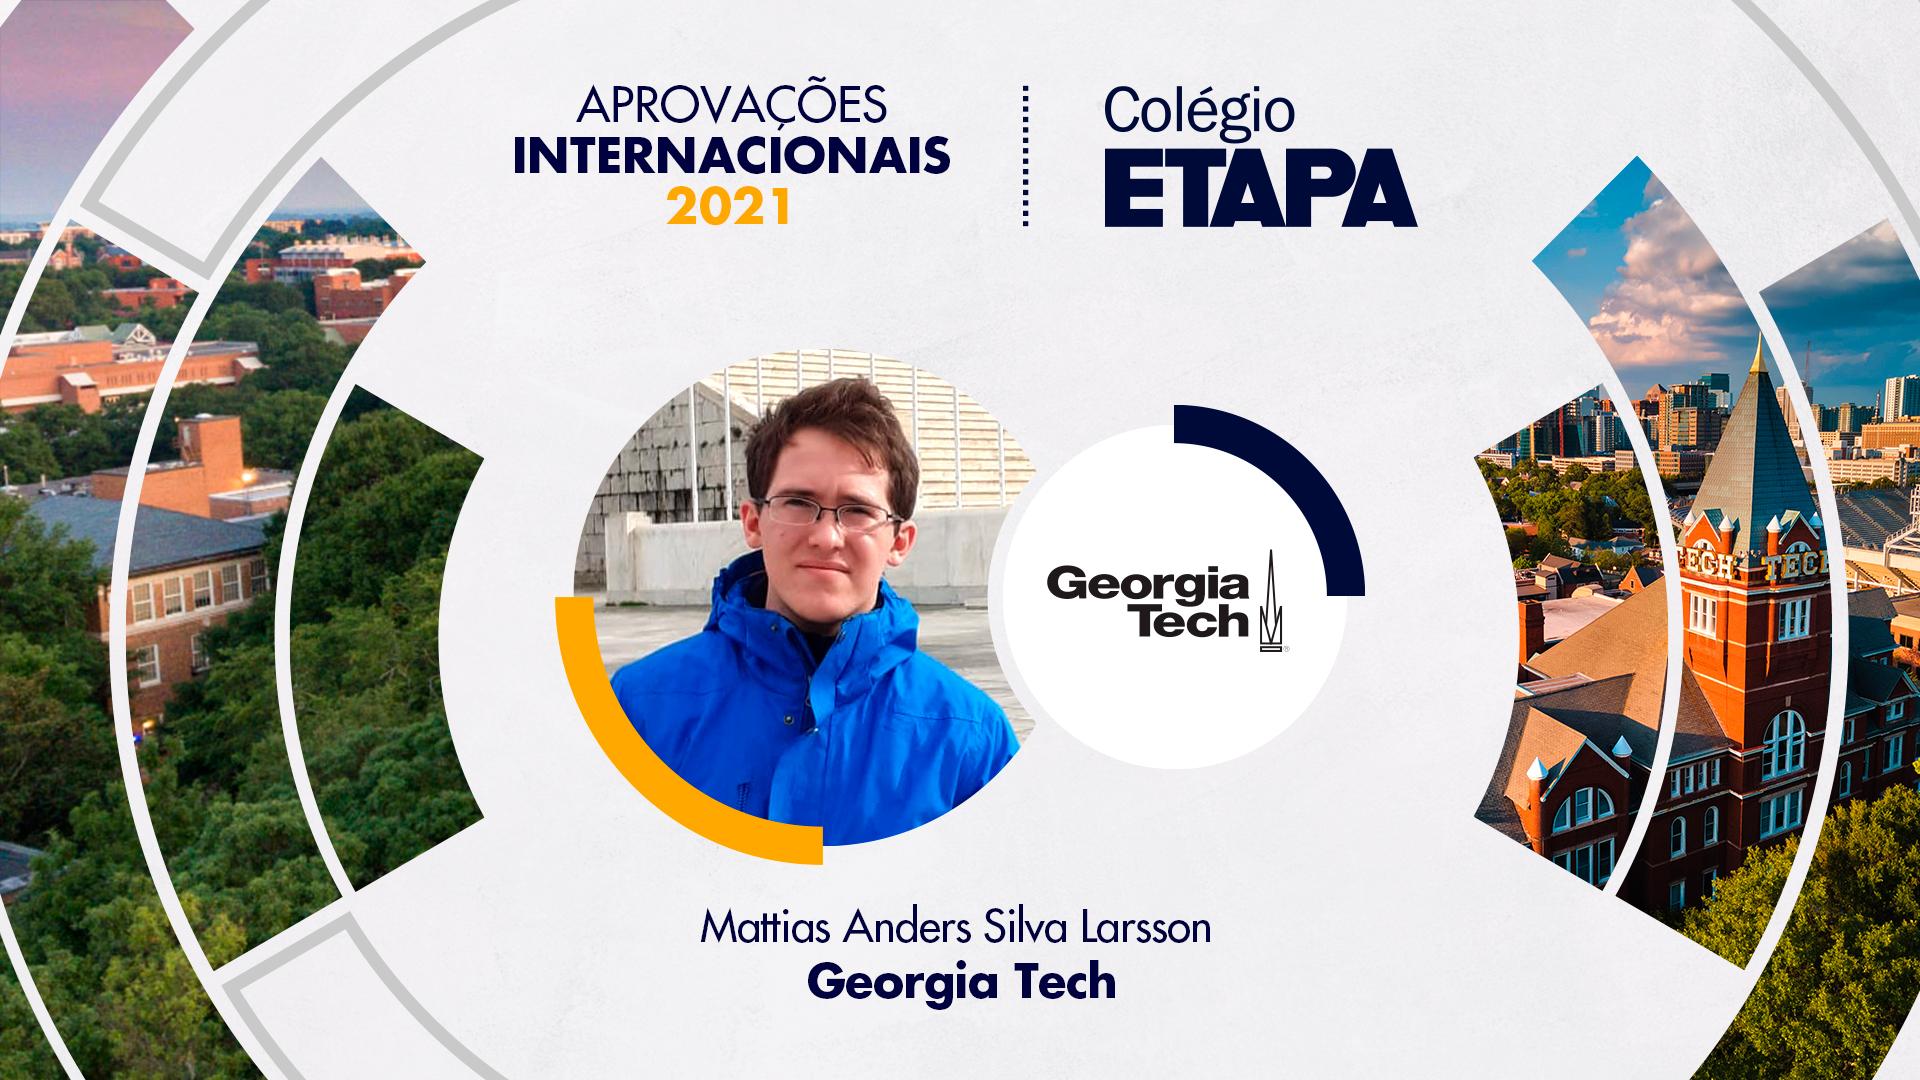 Mattias Anders Silva Larsson vai estudar Engenharia Biomolecular e Química no Georgia Institute of Technology.